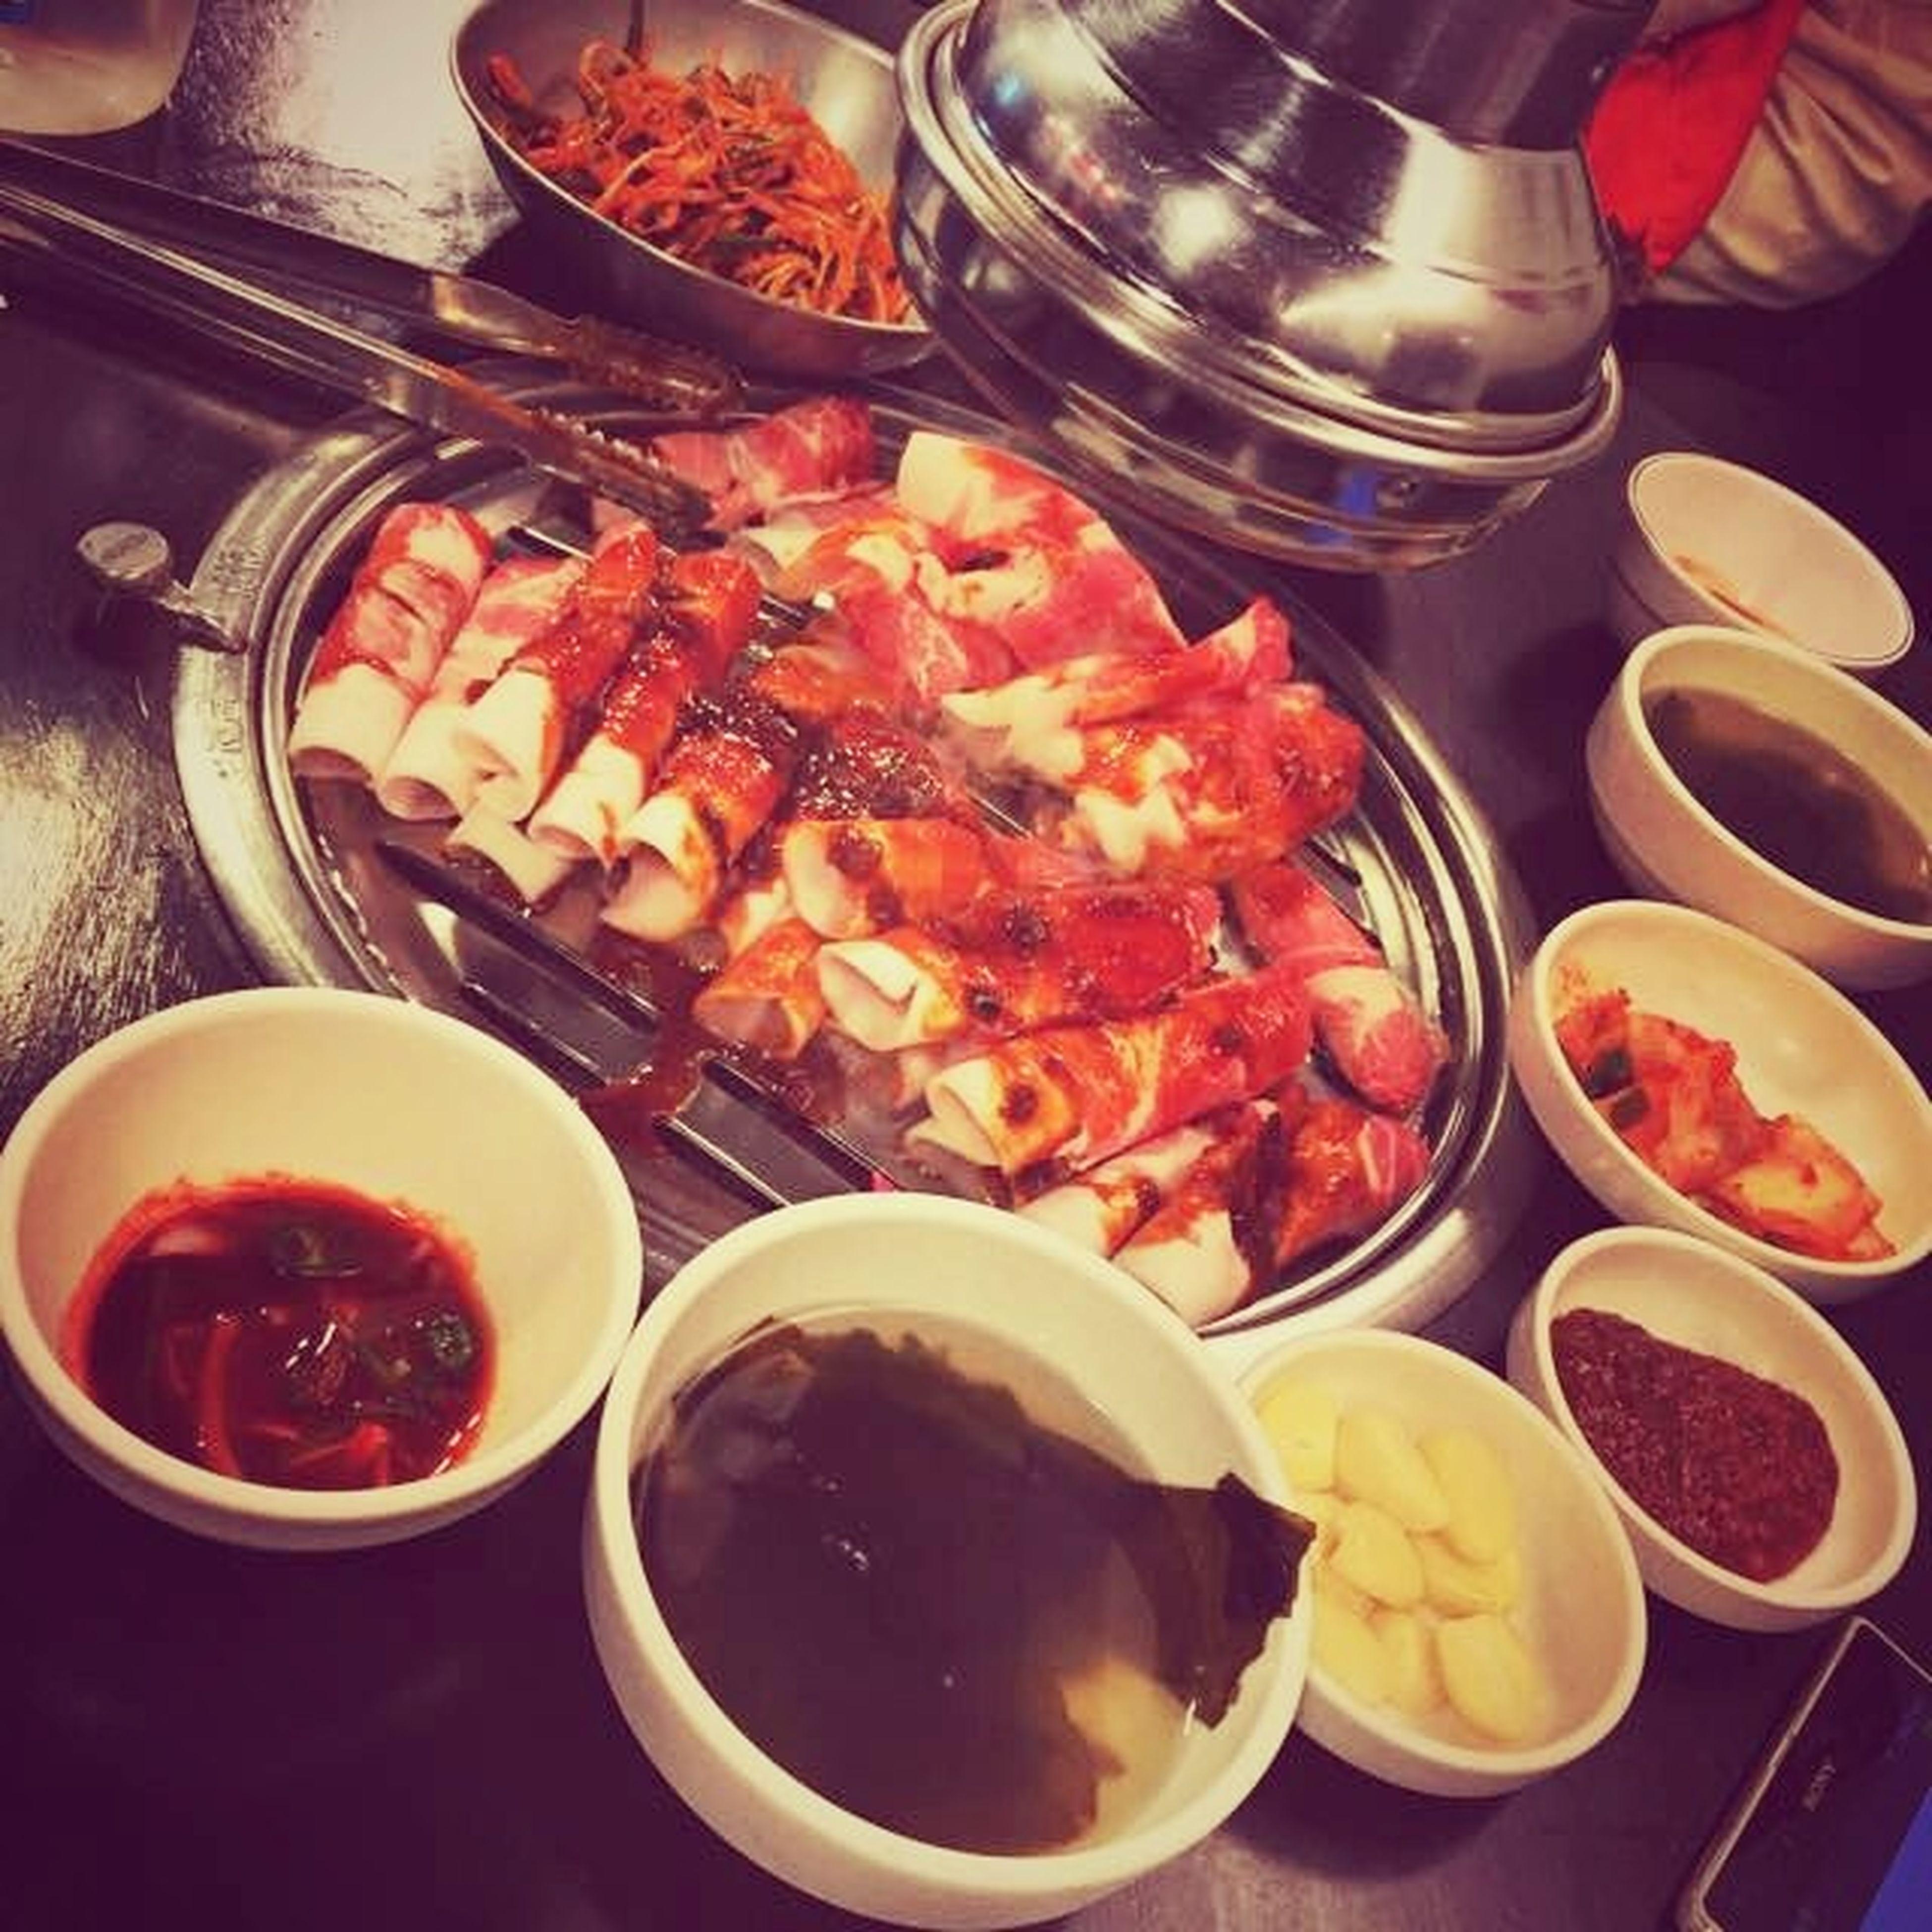 首爾 Seoul 서울 Dinner